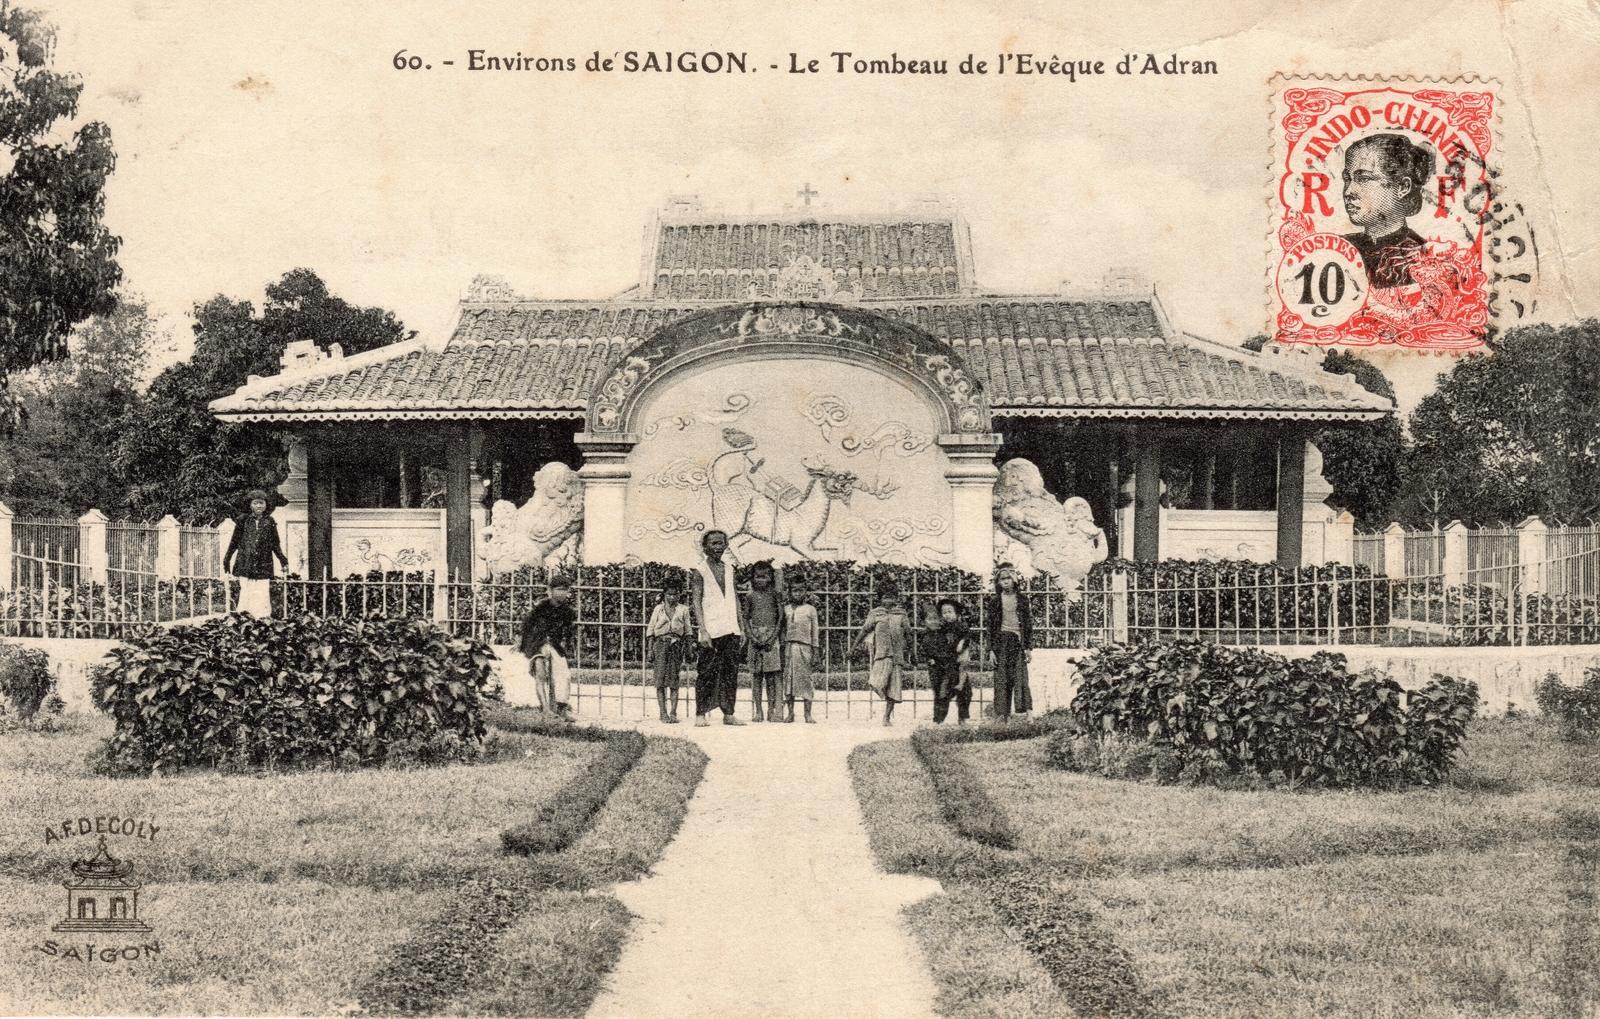 Environ de Saïgon -  Environ de Saïgon-Le Tombeau de l'Évêque d'Adran